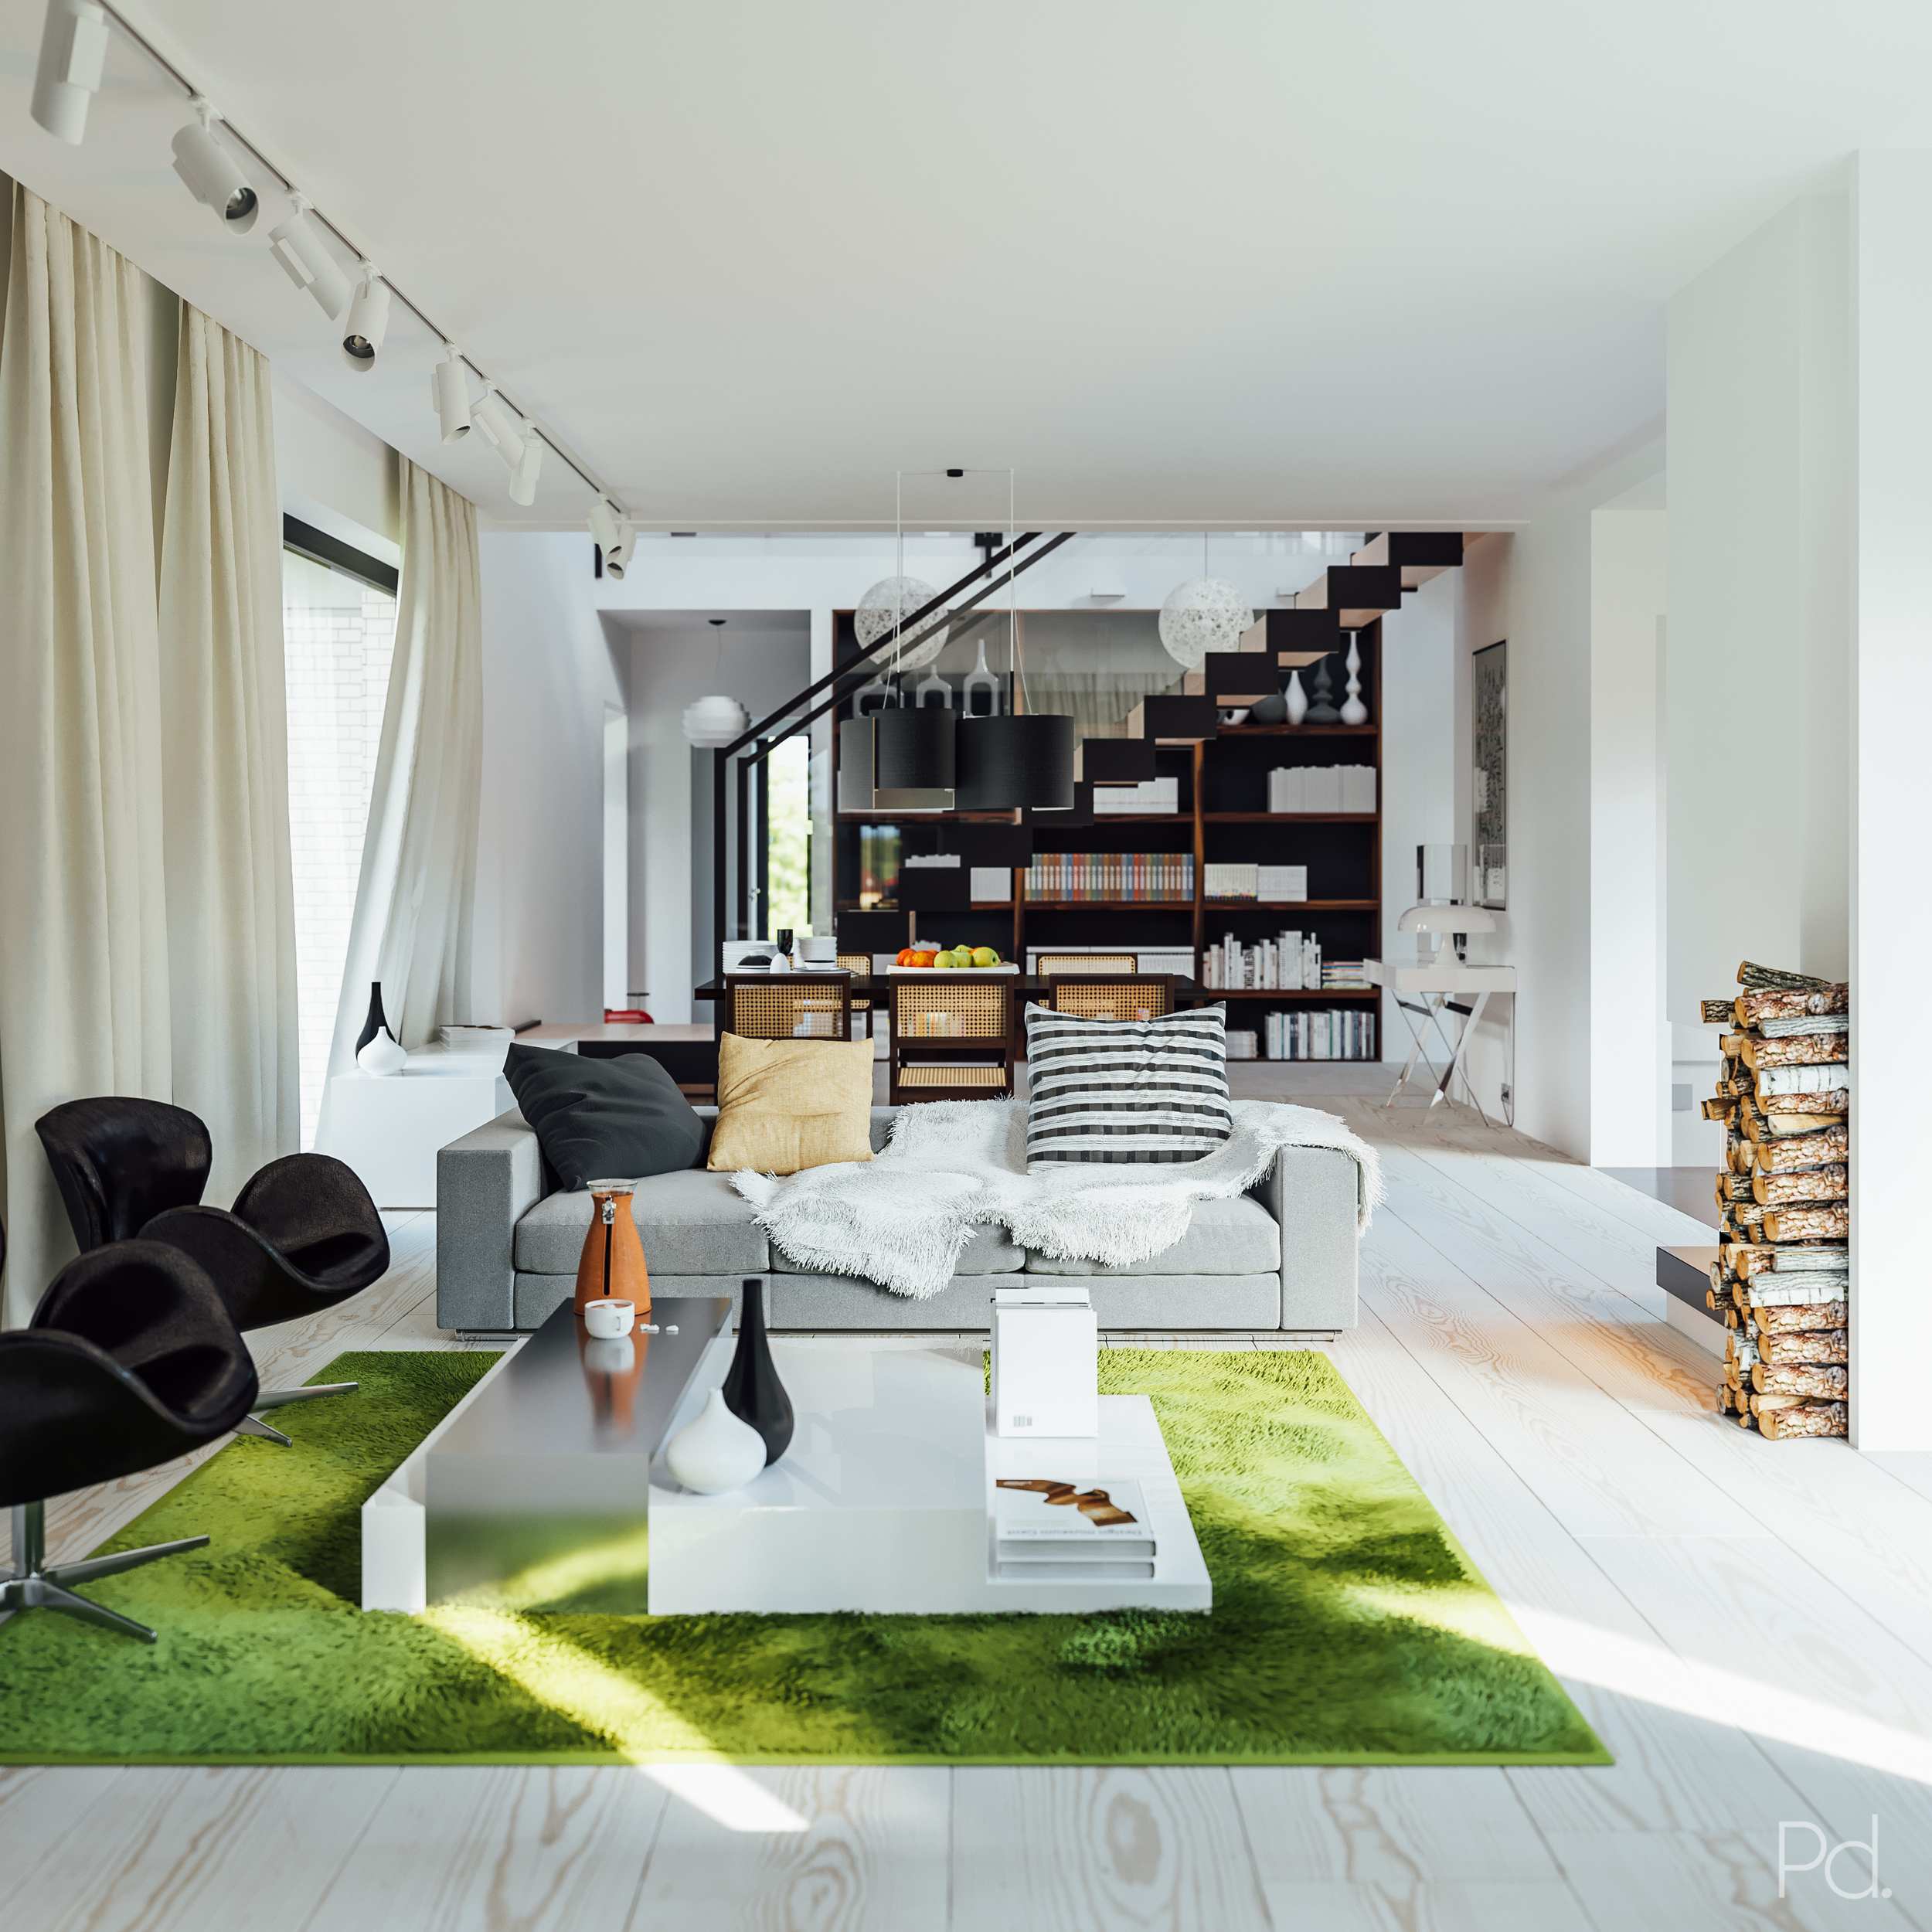 3d visualisation of a modern living room